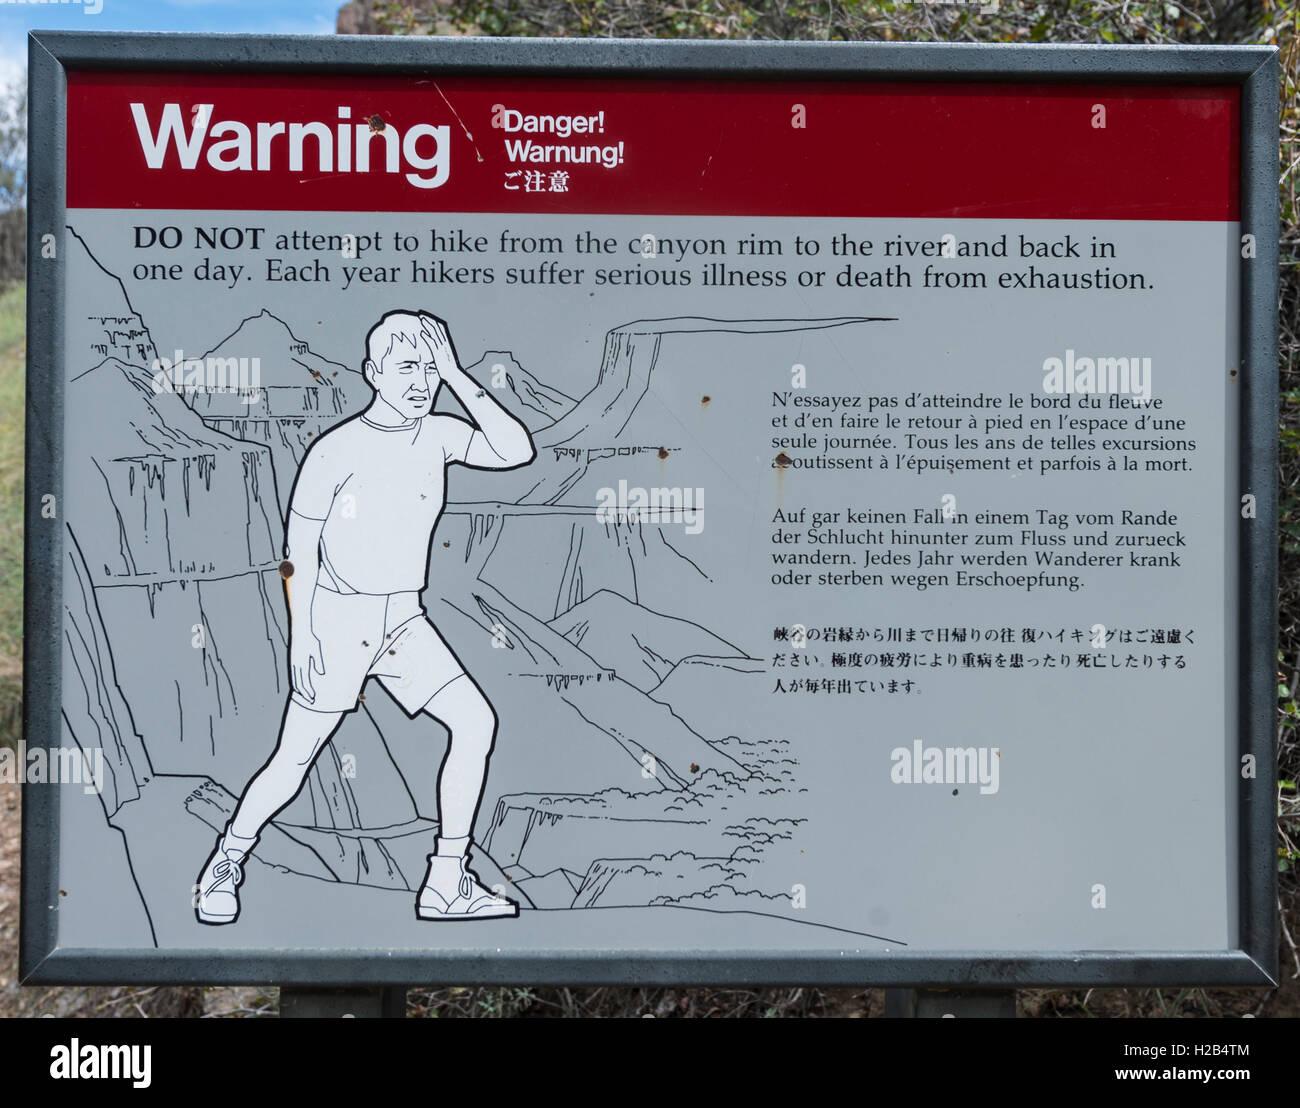 Warnschild für Wanderer, Warnung Erschöpfung und Hitze, Grand Canyon National Park, Arizona, USA Stockbild